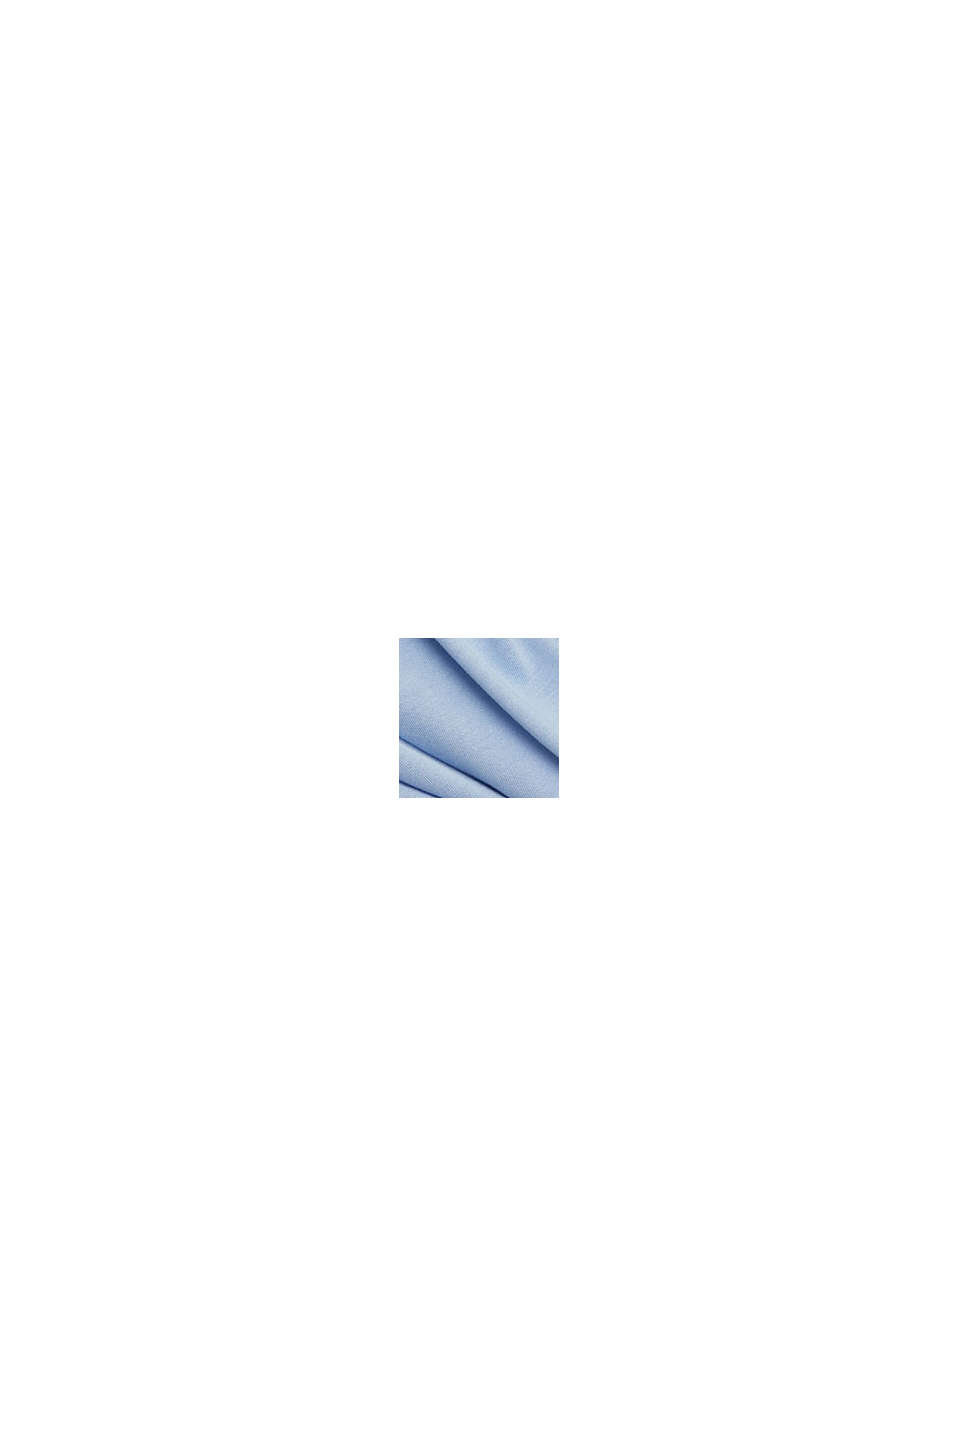 Maglia a maniche lunghe in stile blusa, LENZING™ ECOVERO™, PASTEL BLUE, swatch